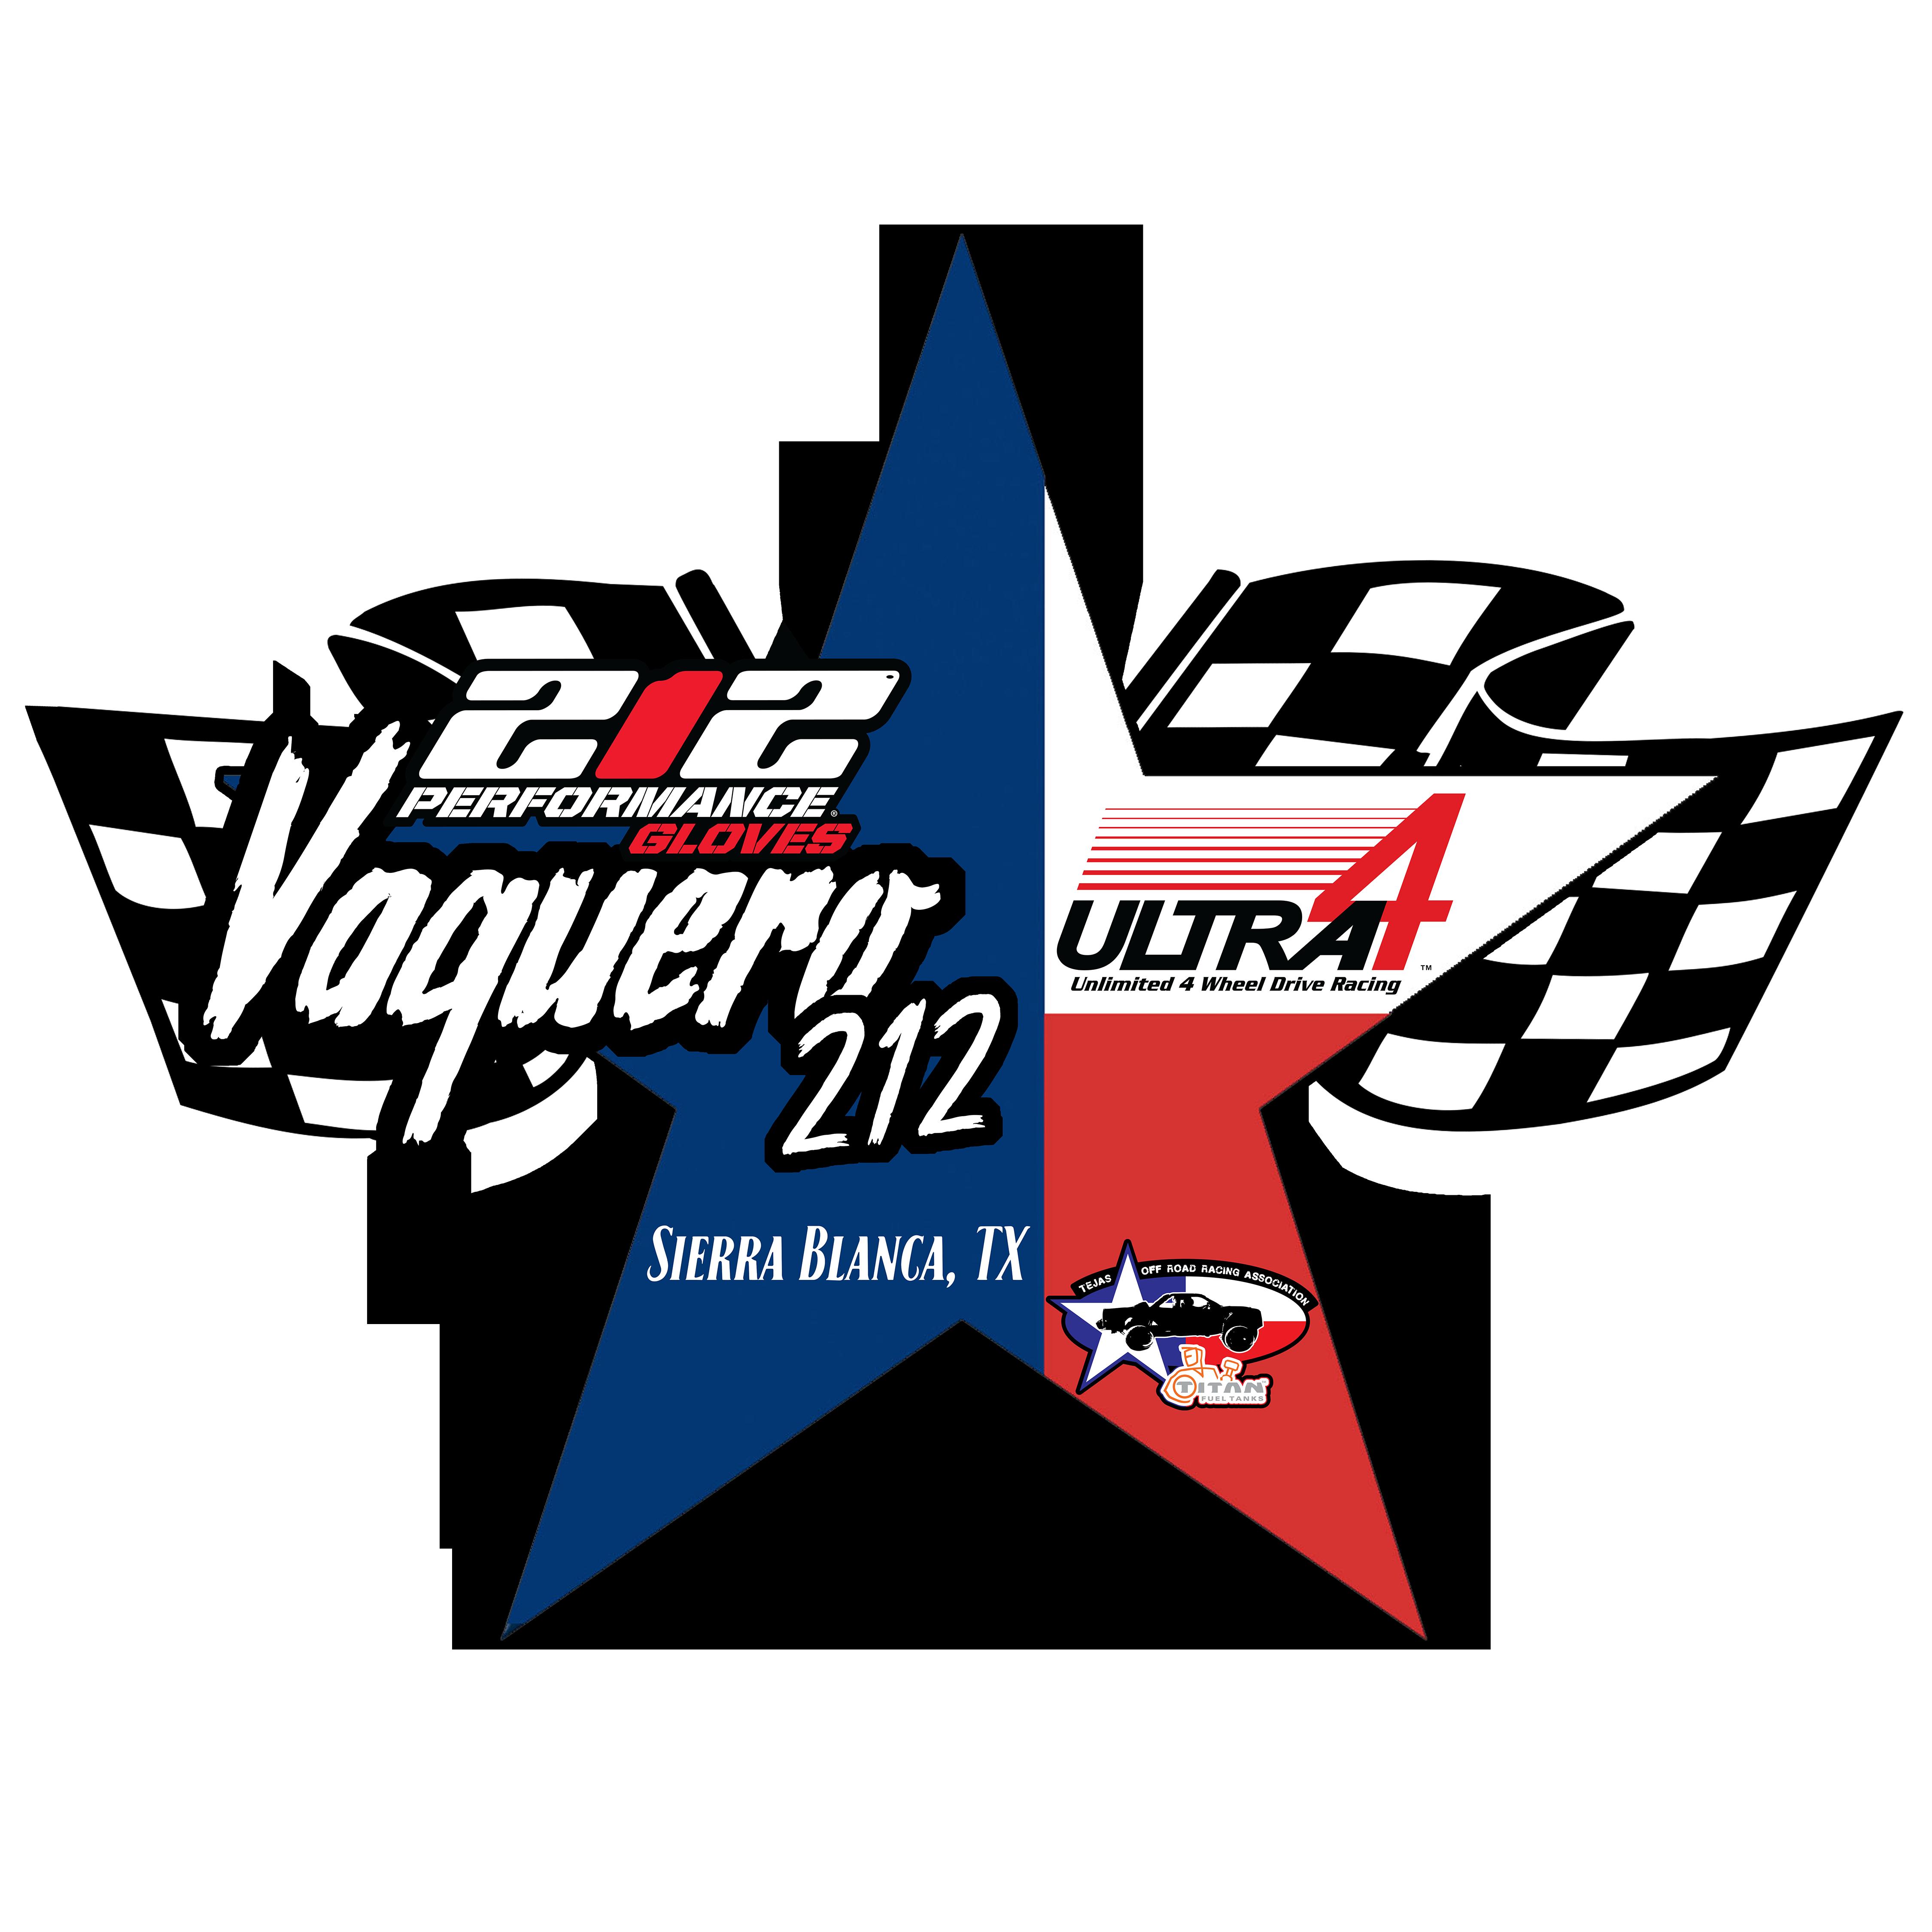 Live Ultra4 Racing